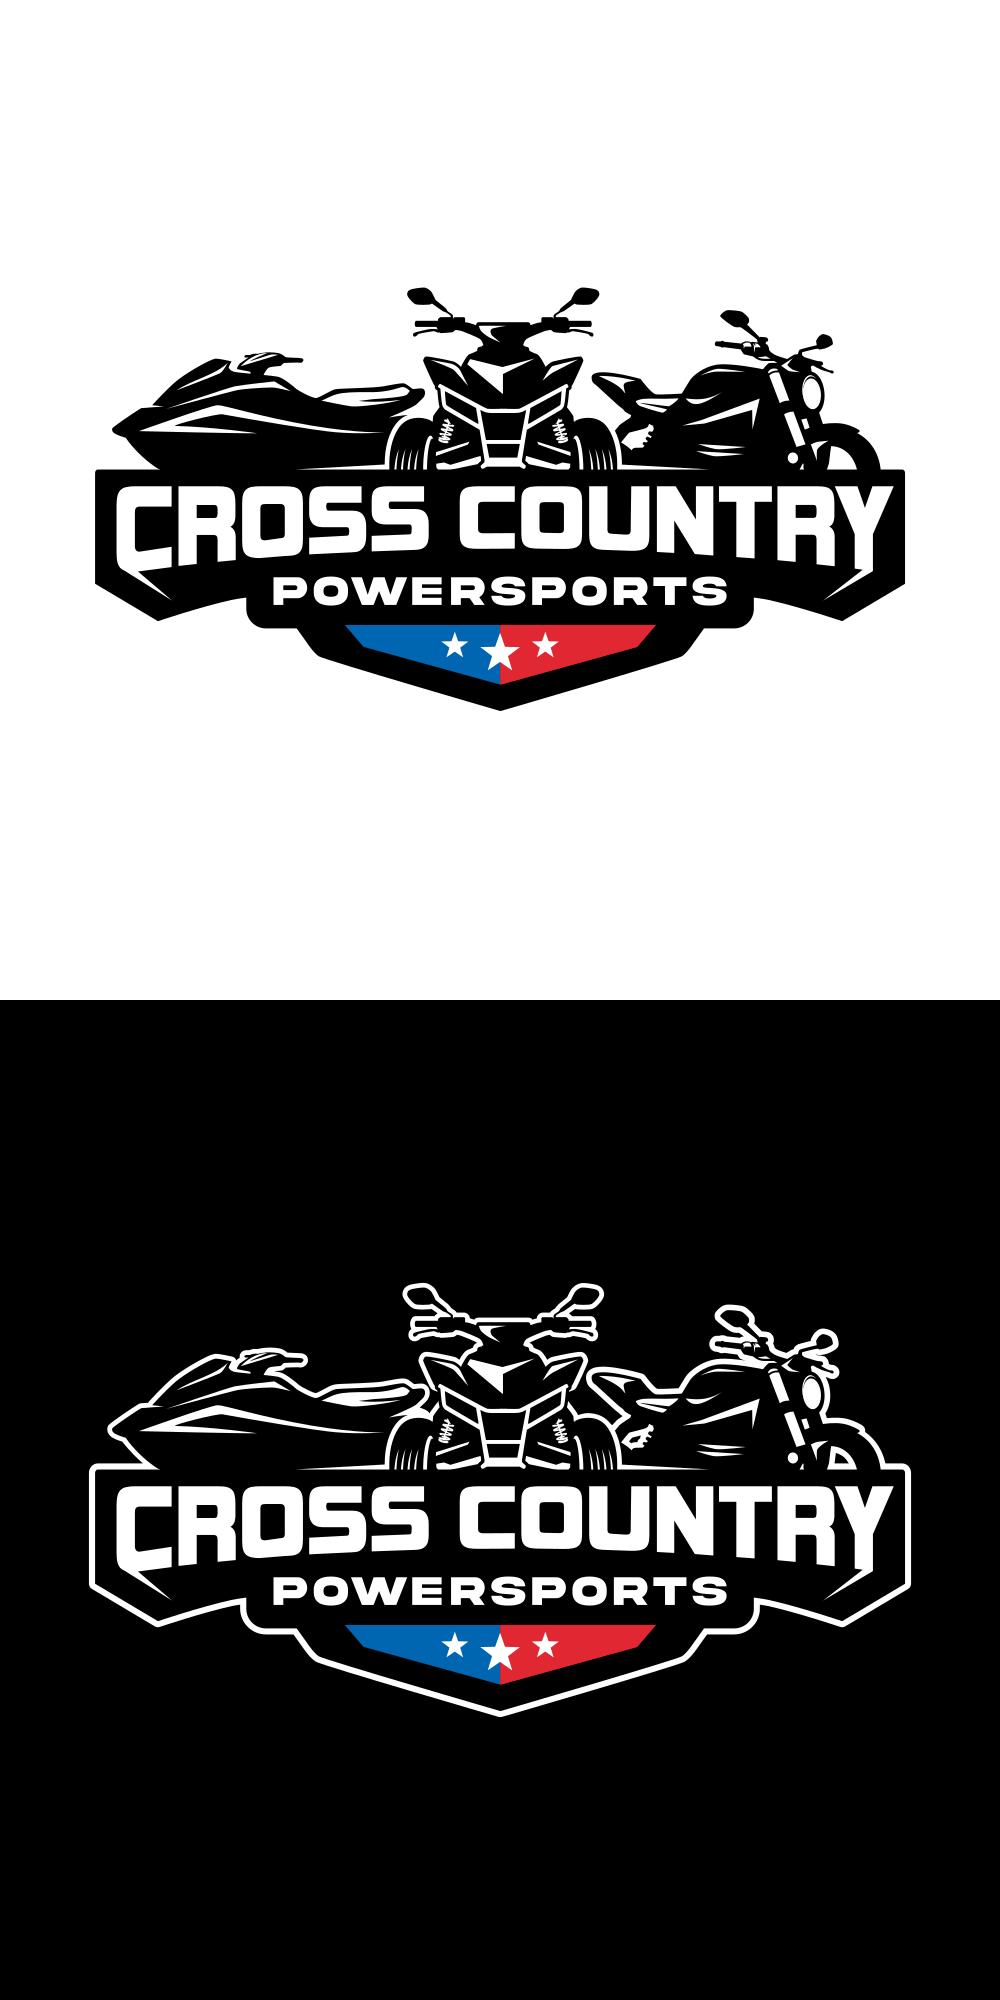 Powersports Logo Design Contest